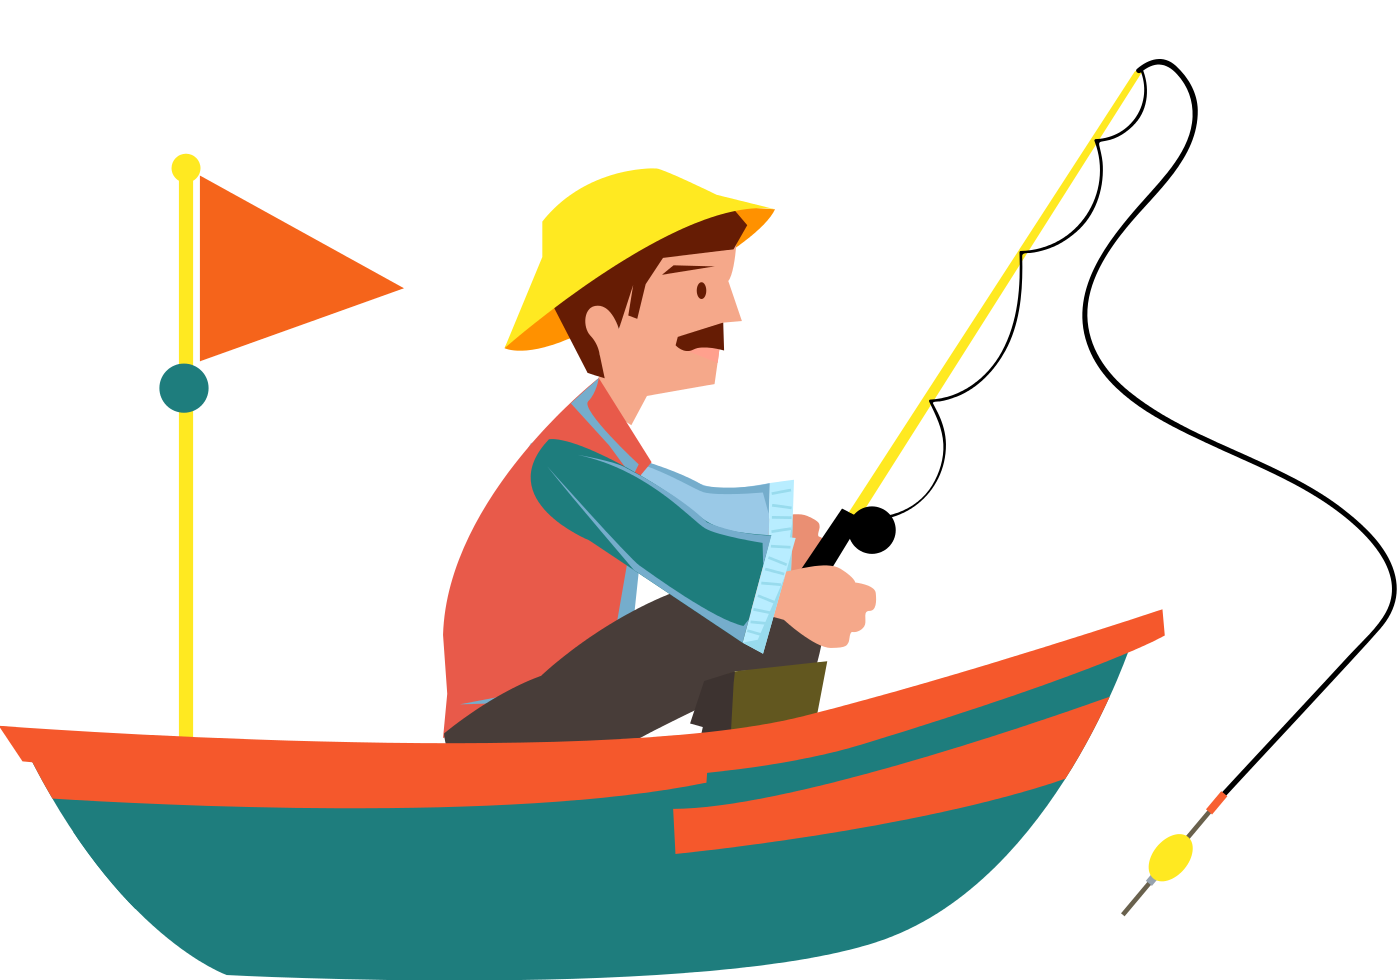 Fisherman clipart sad. Water sports in kerala